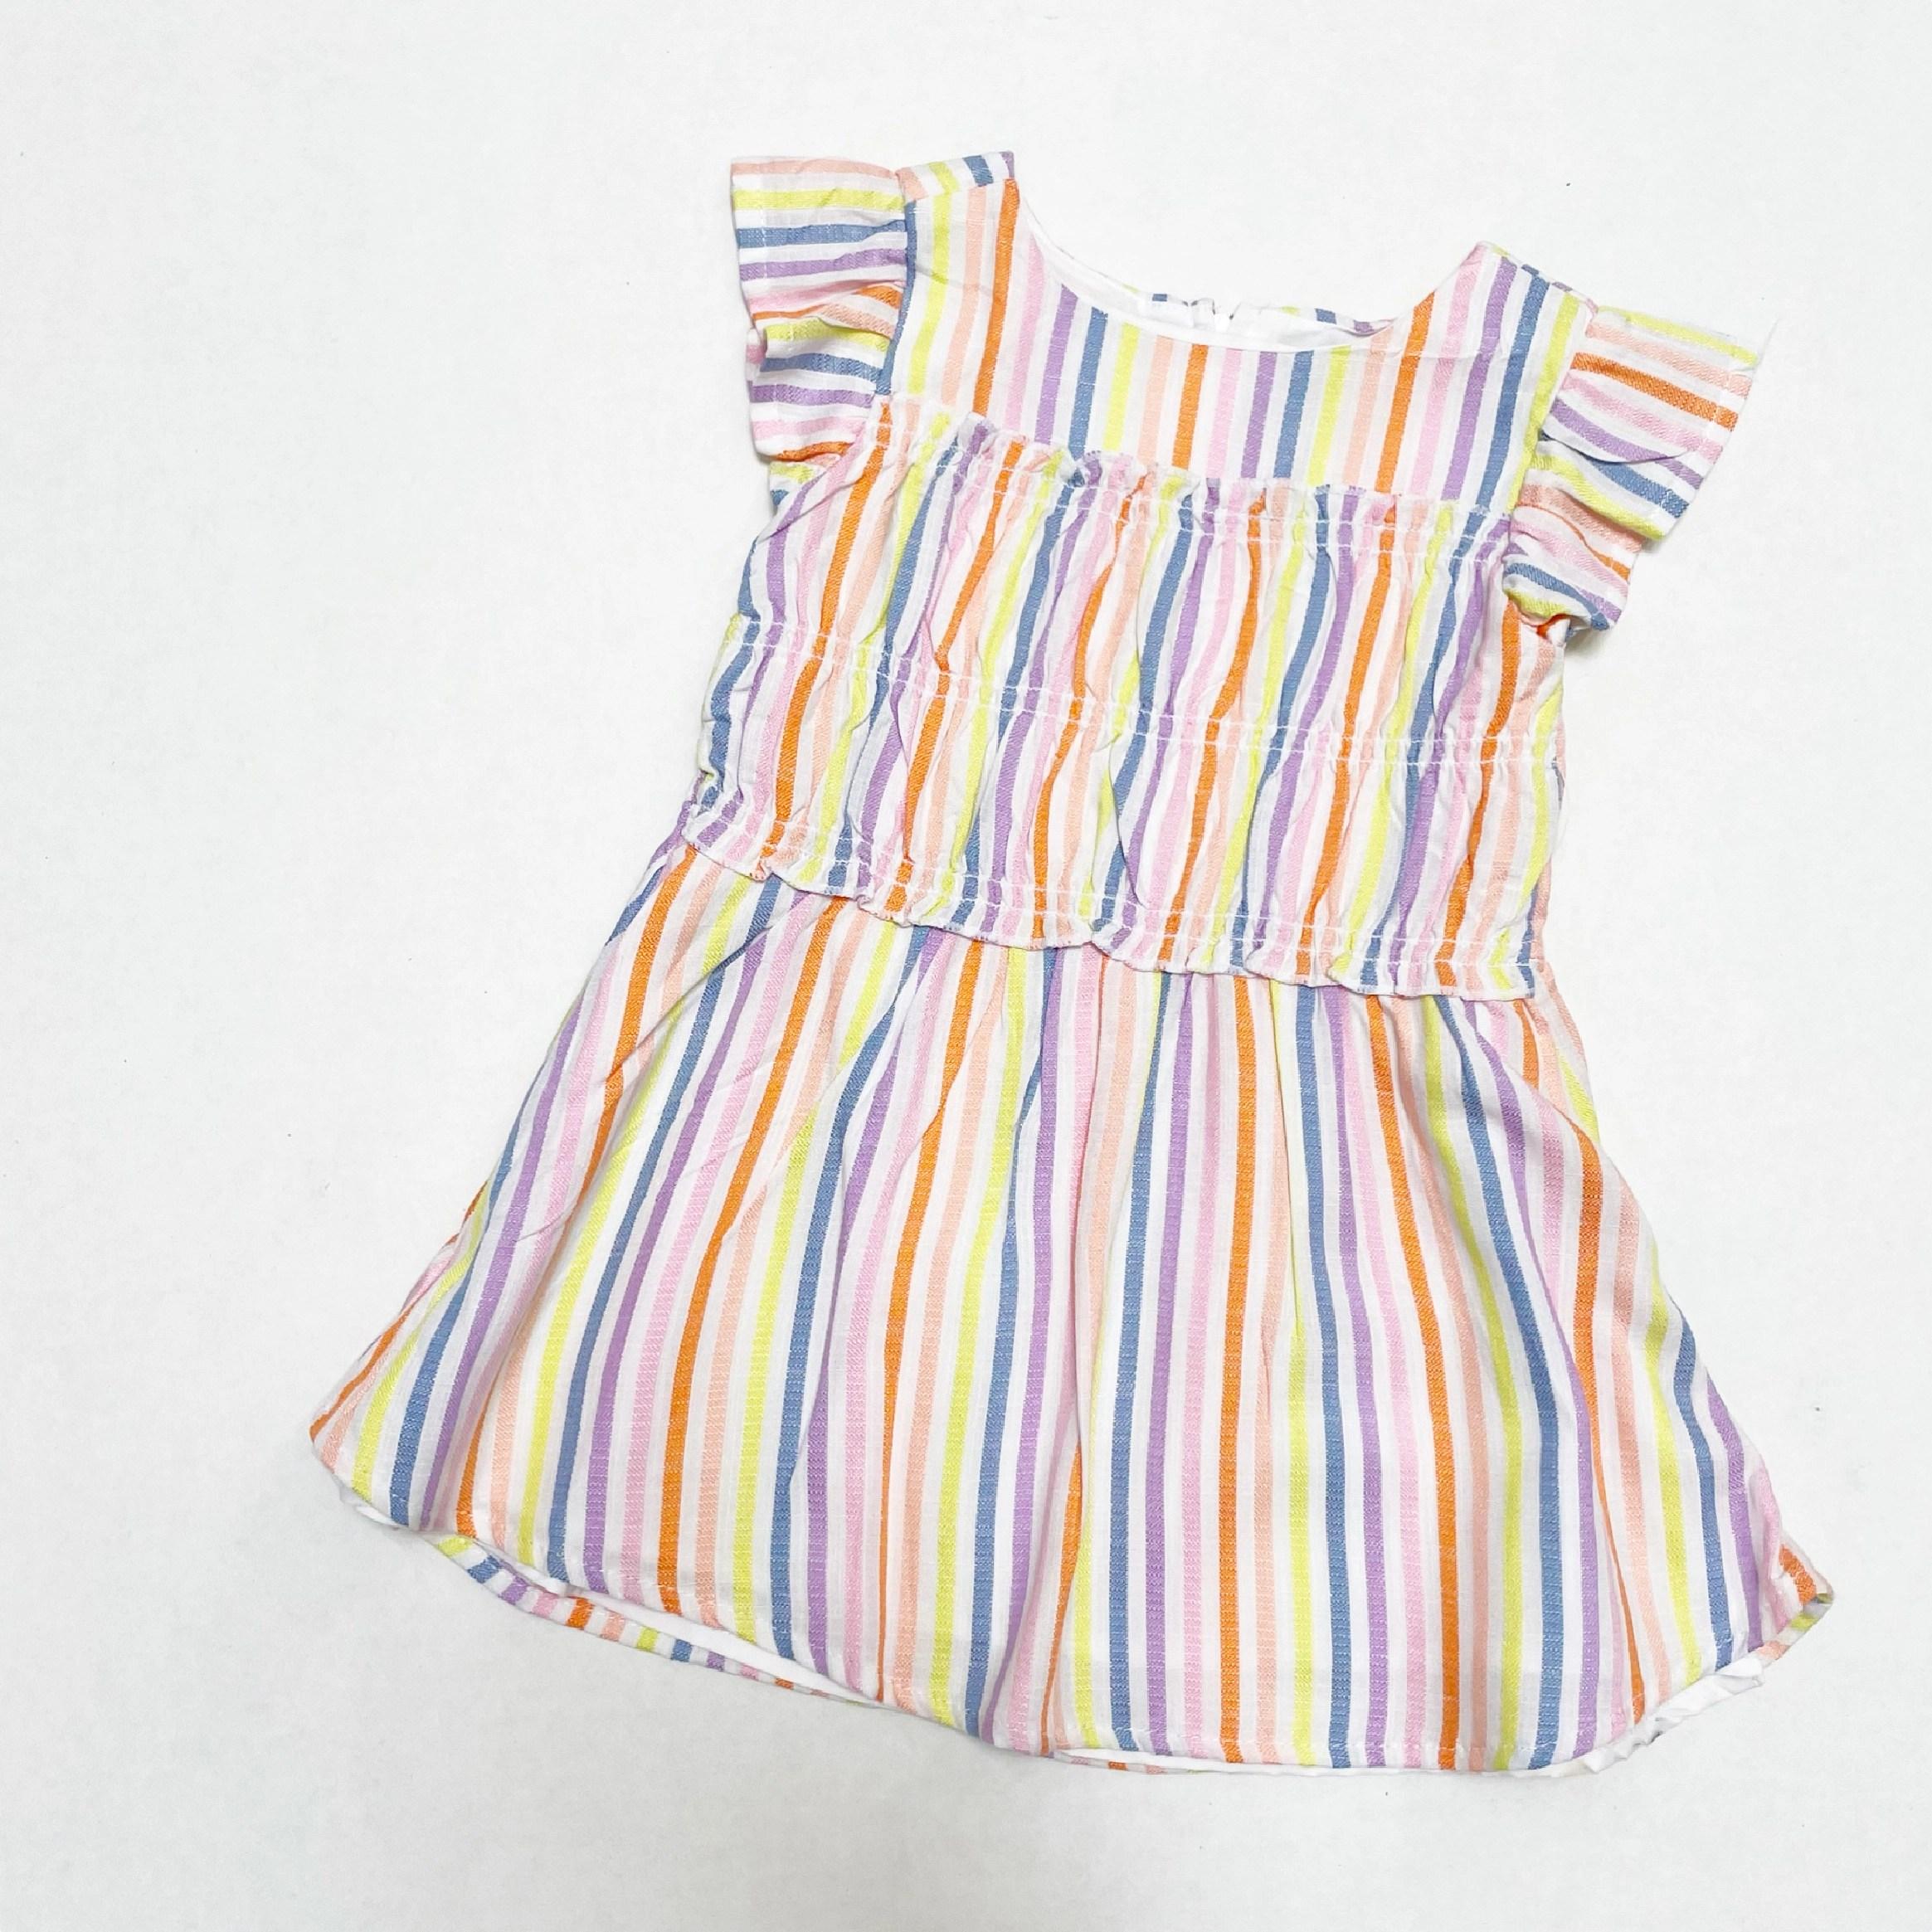 Wonder Nation Baby Girls & Toddler Girls Smocked Dress with Flutter Sleeves, Sizes 12M-5T